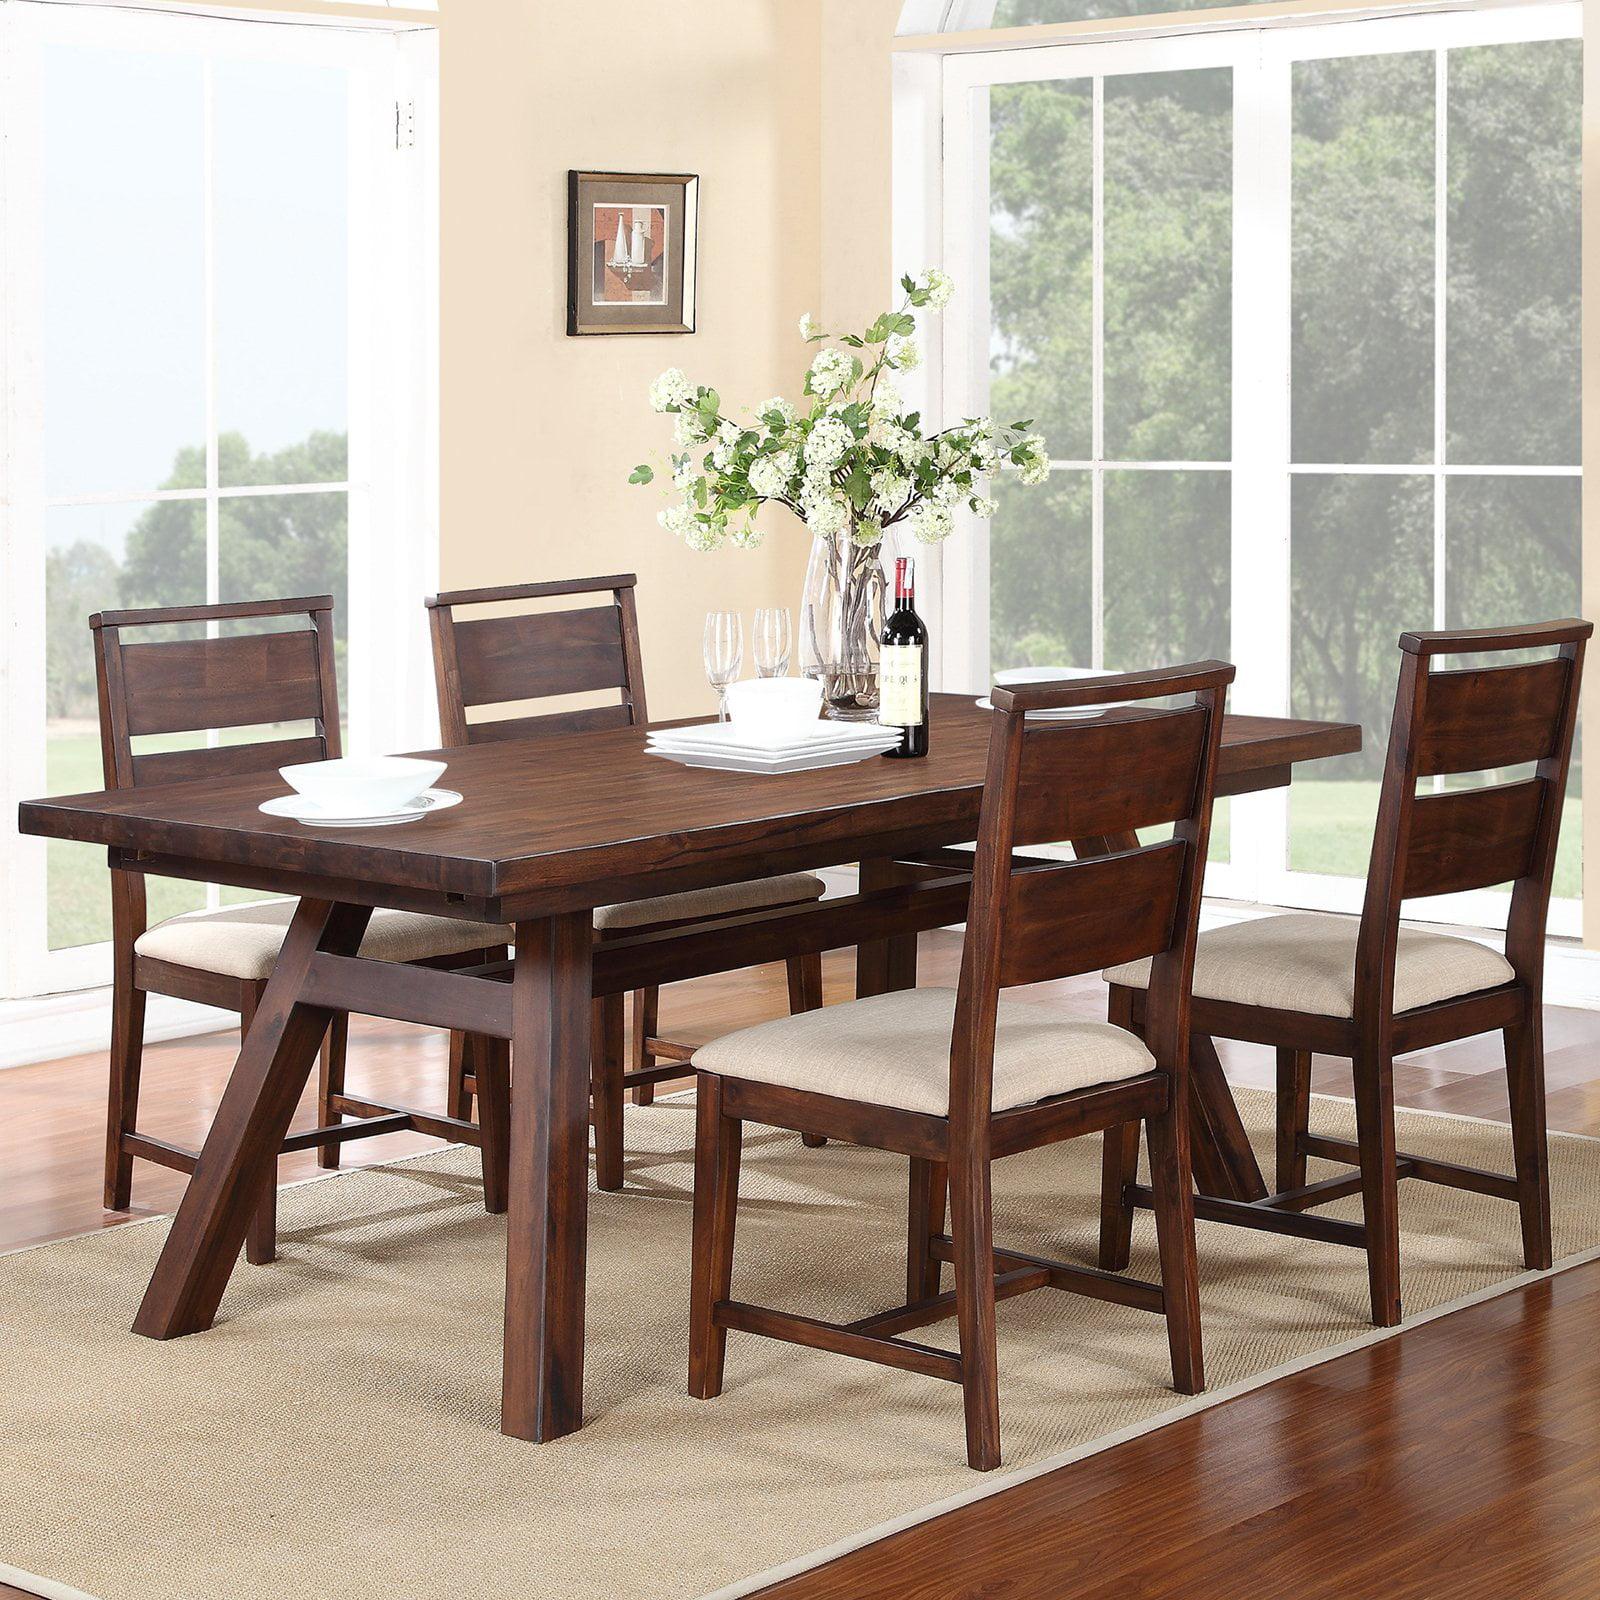 Modus Portland Rectangular 5 Piece Dining Table Set by Modus Furniture International